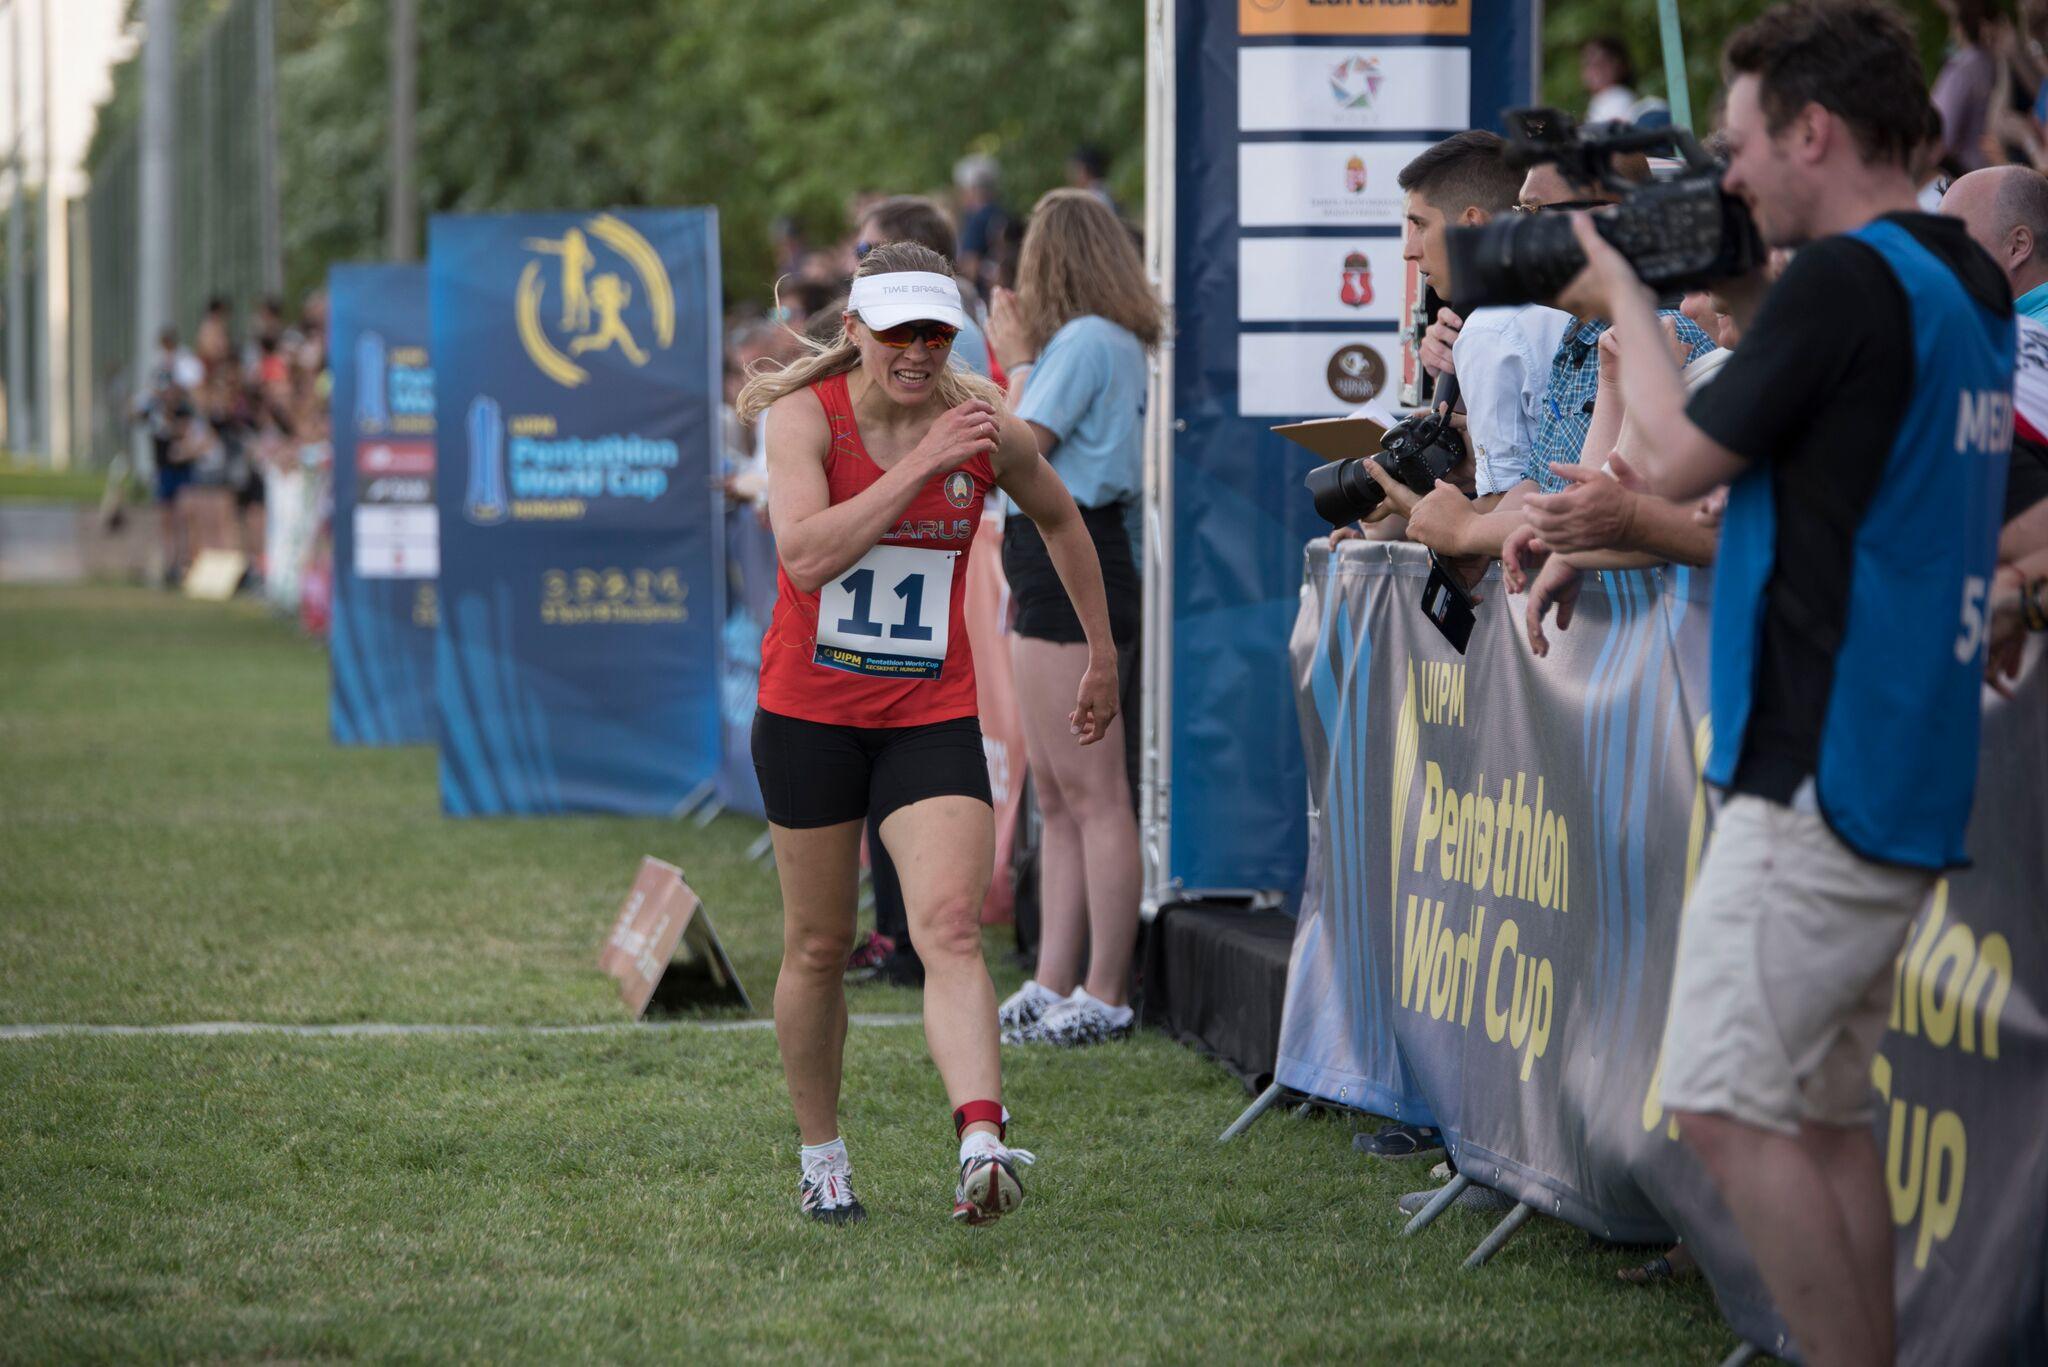 Anastasiya Prokopenko earned silver in a sprint finish ©UIPM